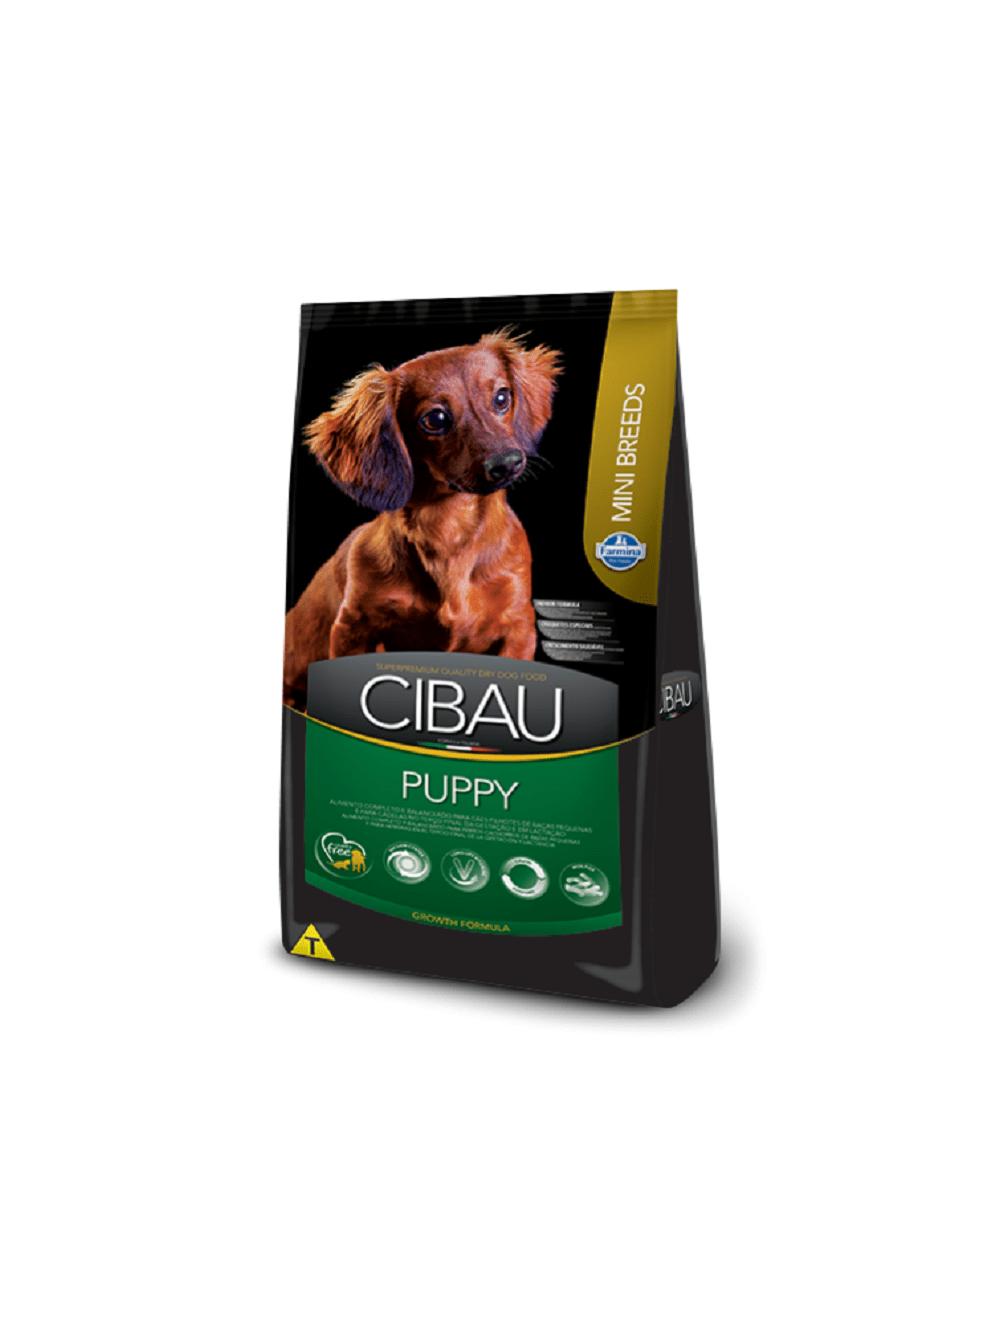 Cibau Puppy Mini Breed 3 KG